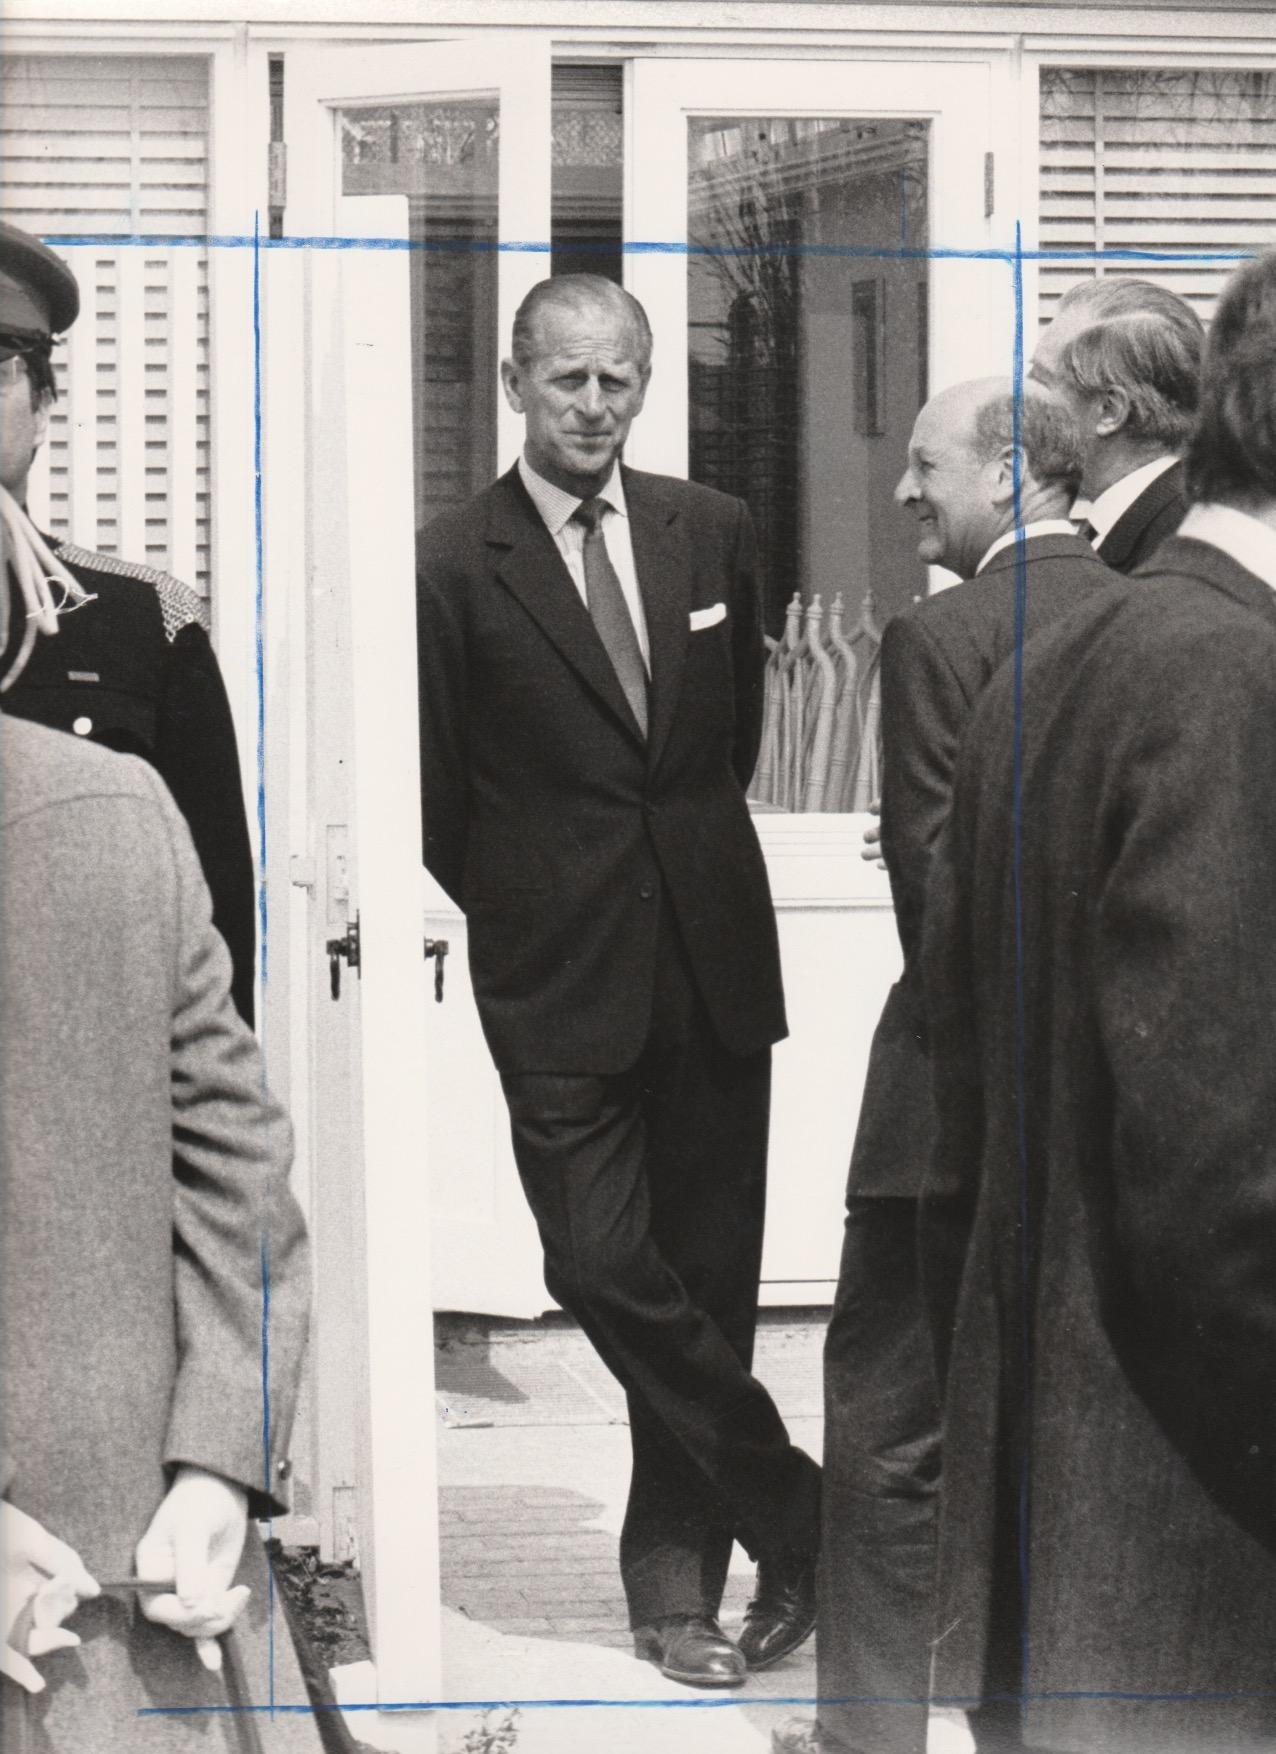 Royalty Prince Philip